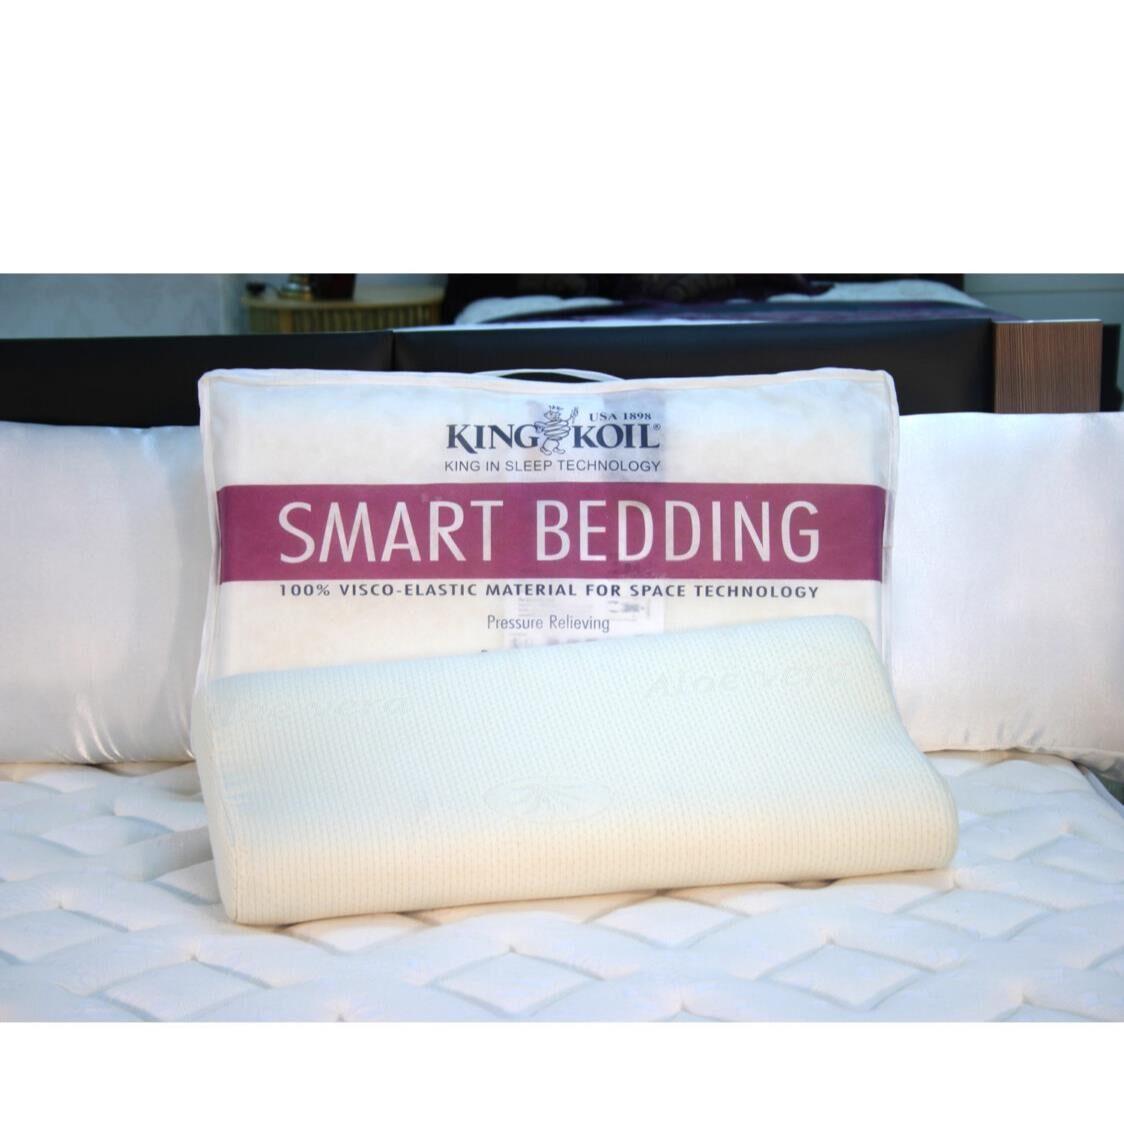 King Koil Smart Bedding Support 2 Pillow